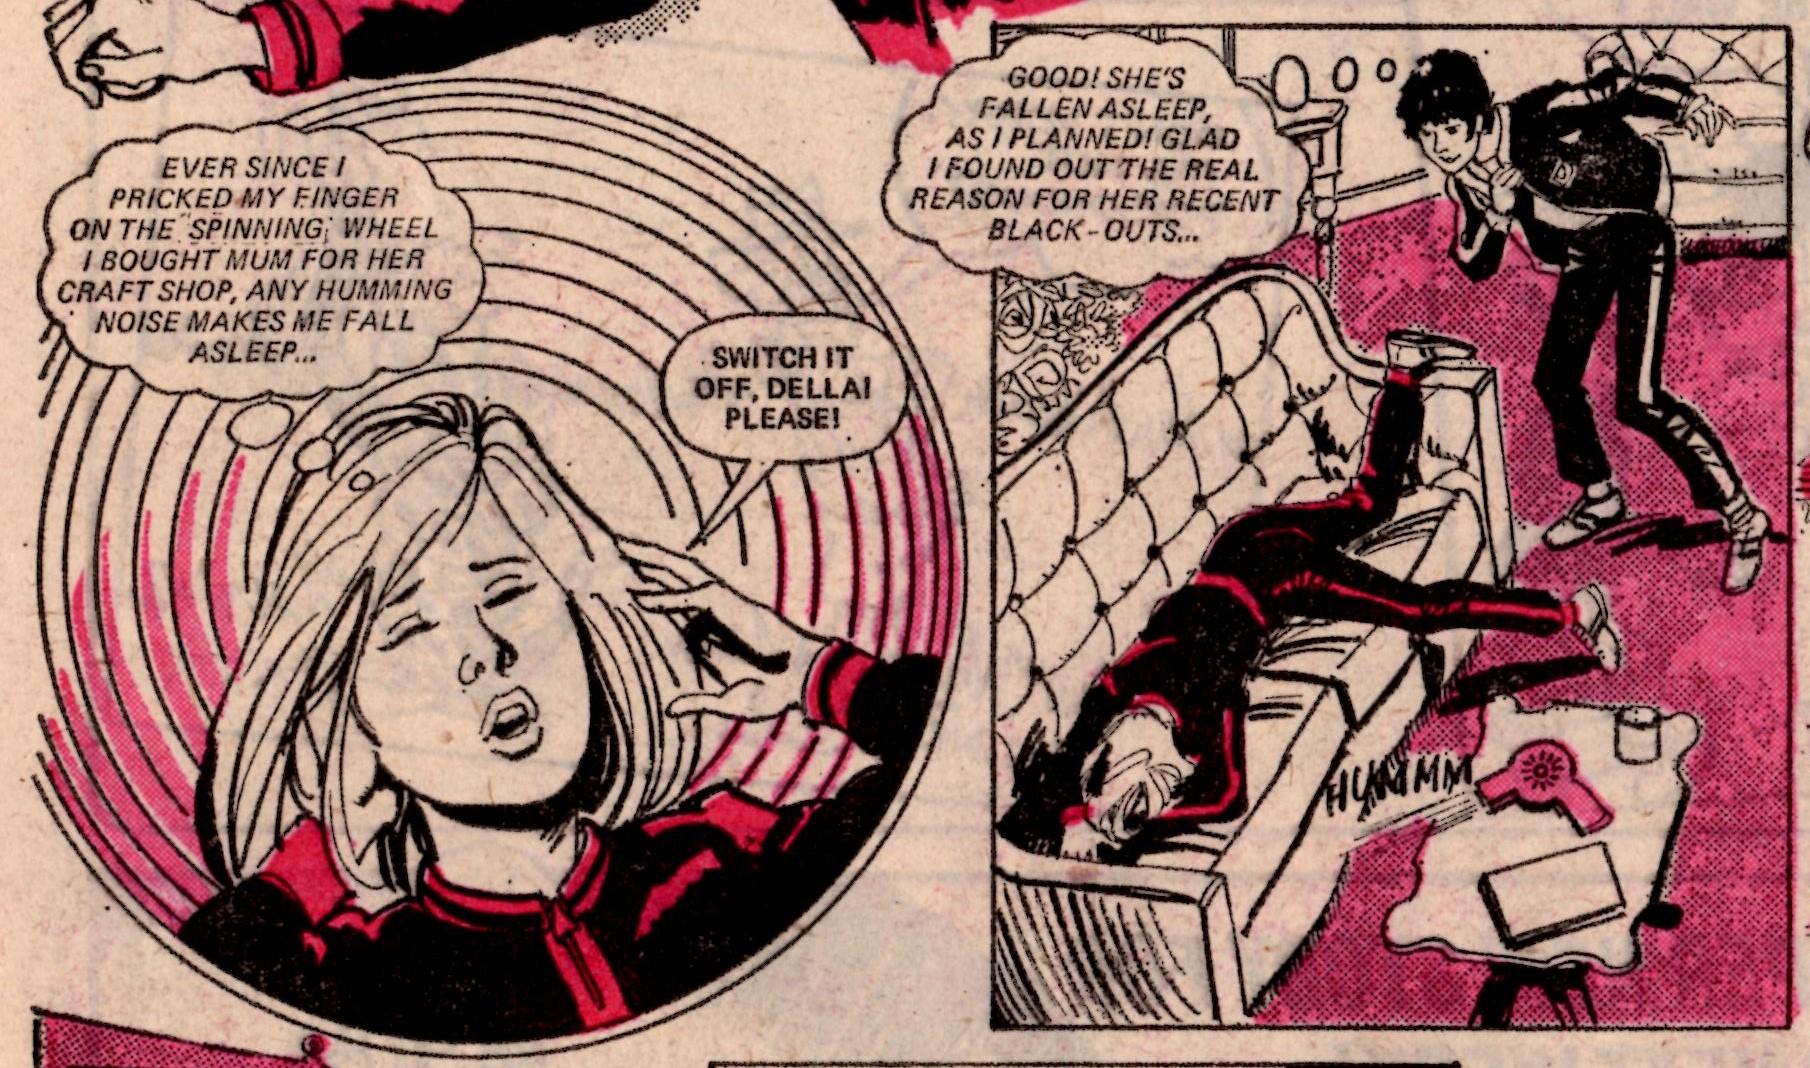 Spell of the Spinning Wheel: Alison Christie (writer), Jim Baikie (artist)